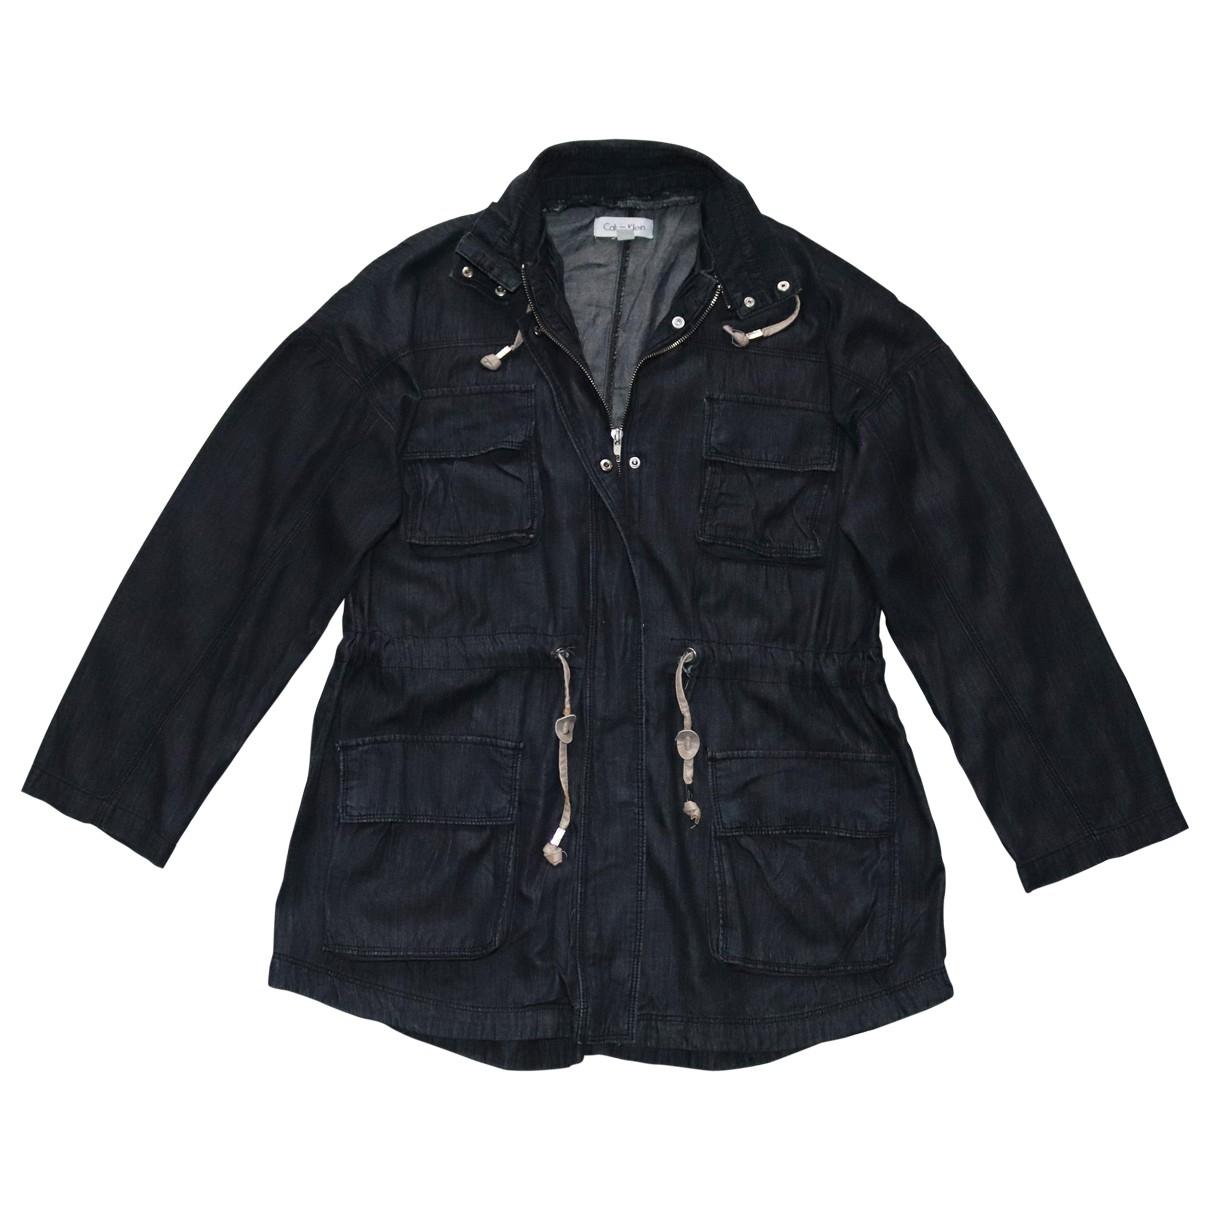 Calvin Klein \N Navy Denim - Jeans jacket for Women M International